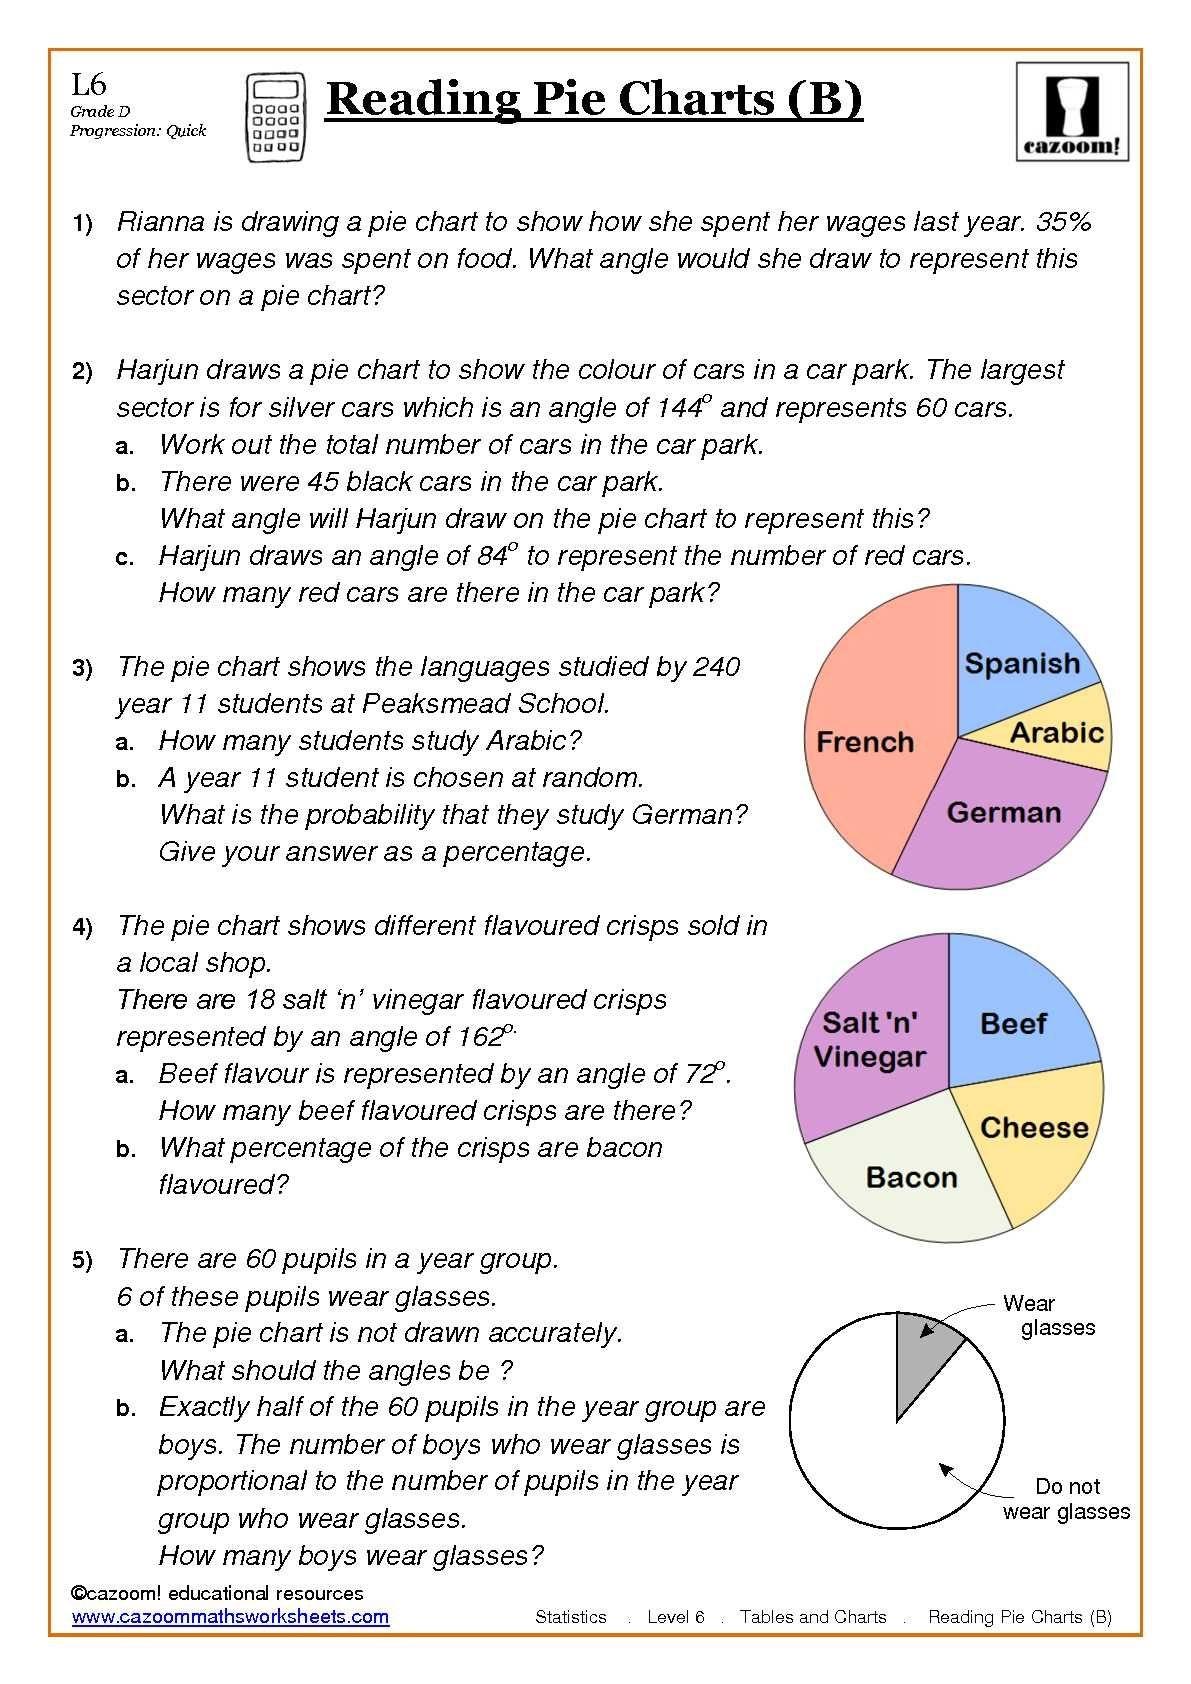 Maths Worksheets | Things To Wear | Math Worksheets, Worksheets For - Free Printable Statistics Worksheets